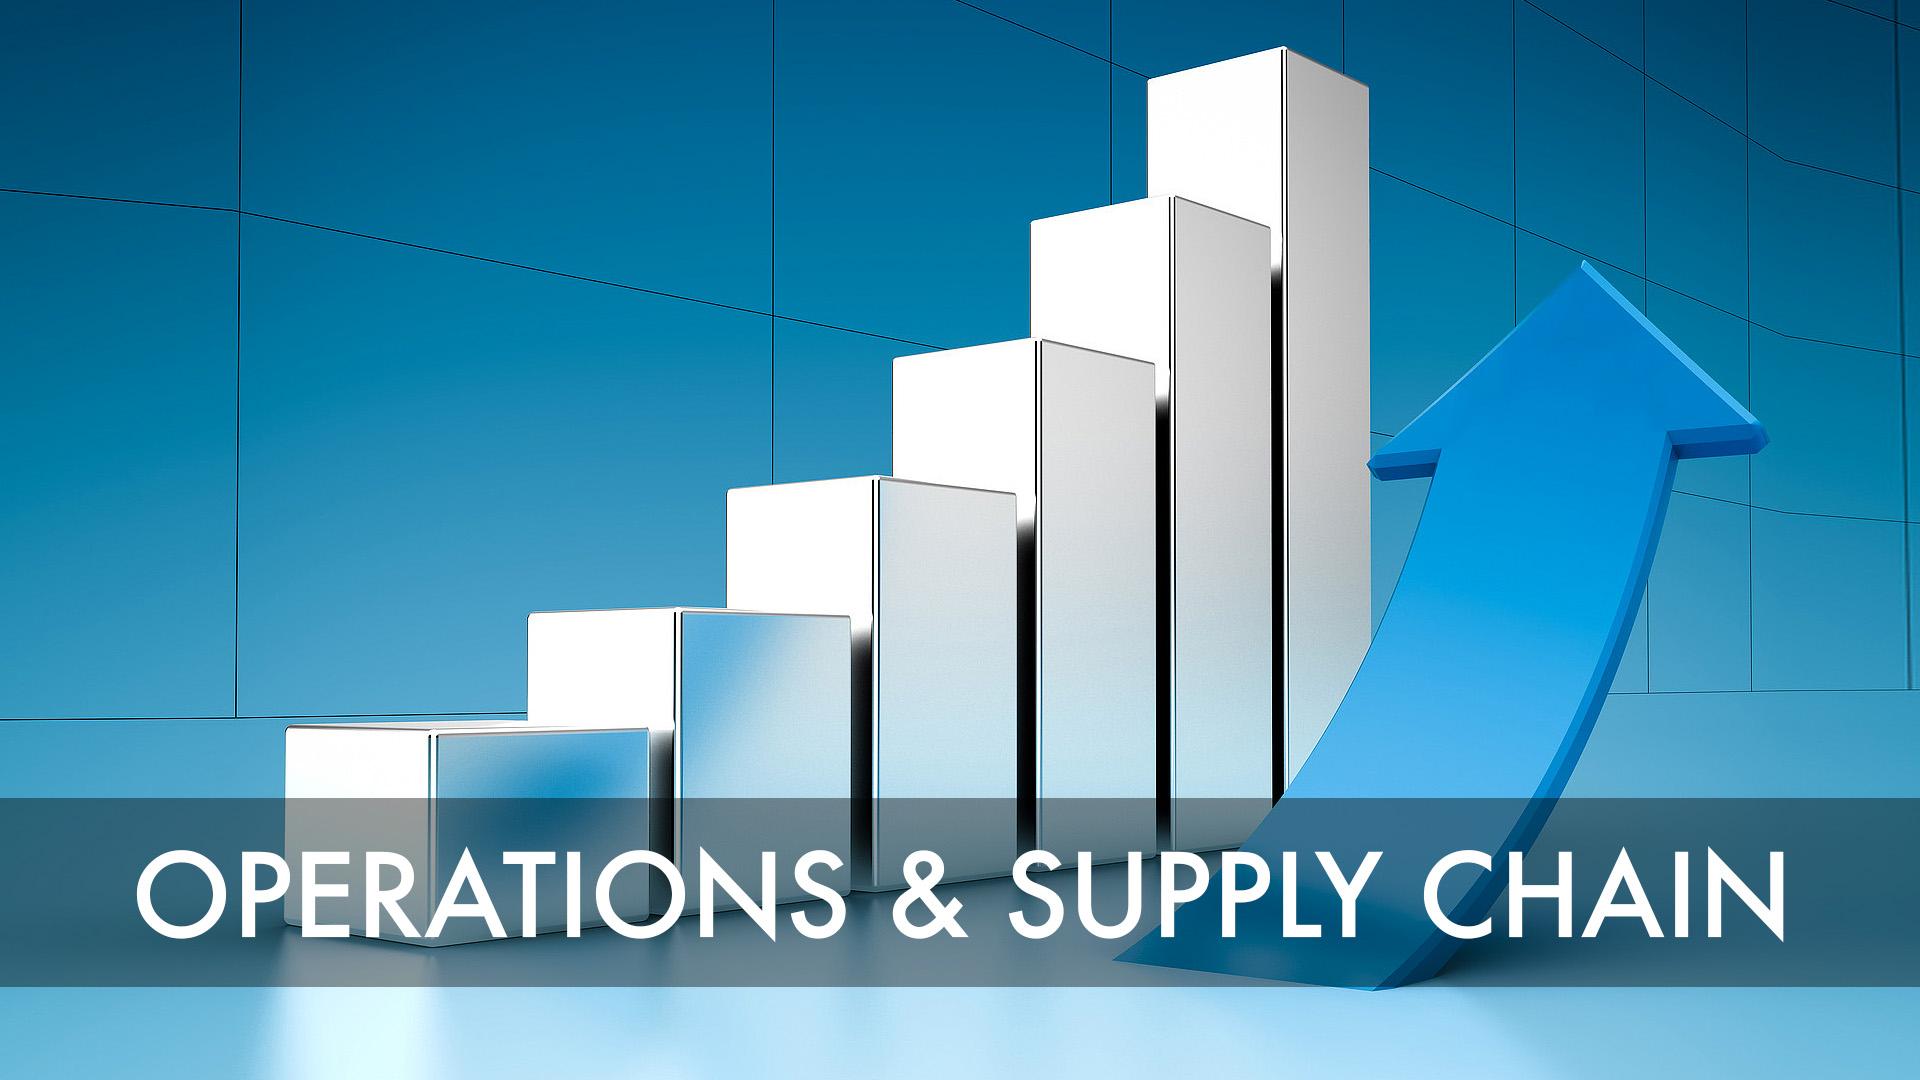 Operations & Supply Chain.jpg